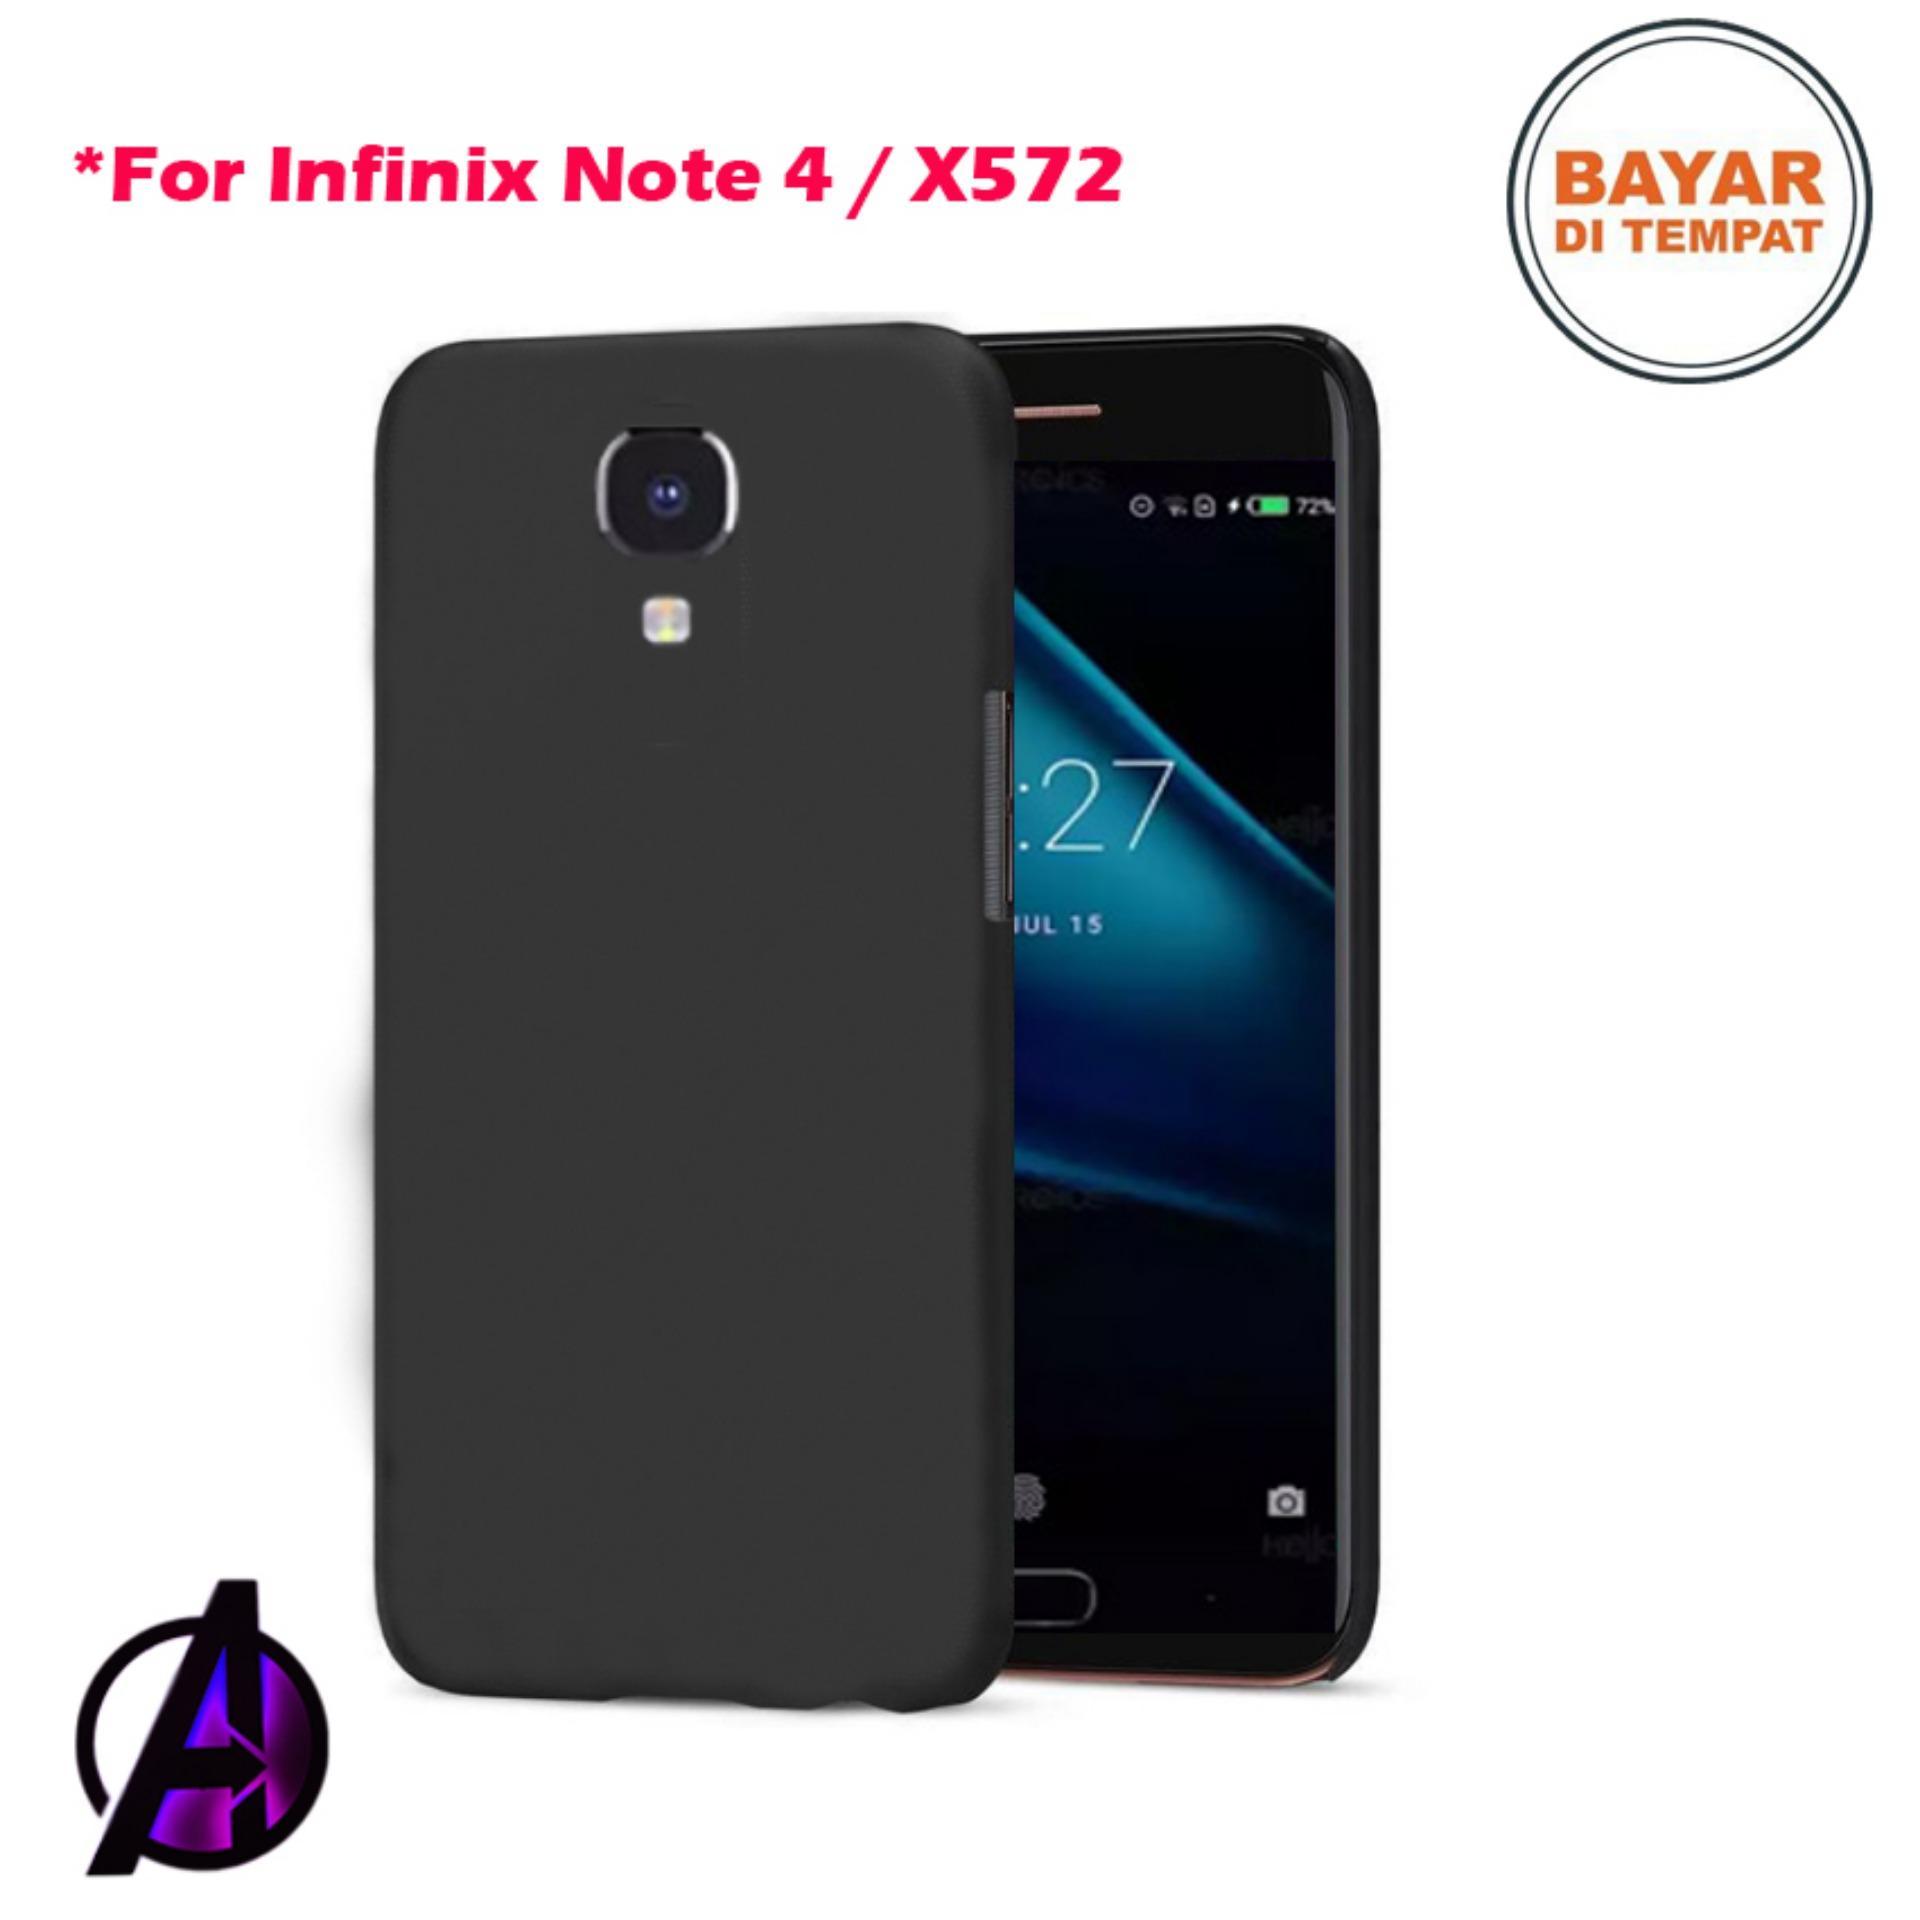 Fitur Case Matte Black Soft Slim Casing Handphone Samsung Galaxy Infinix Note 4 X572